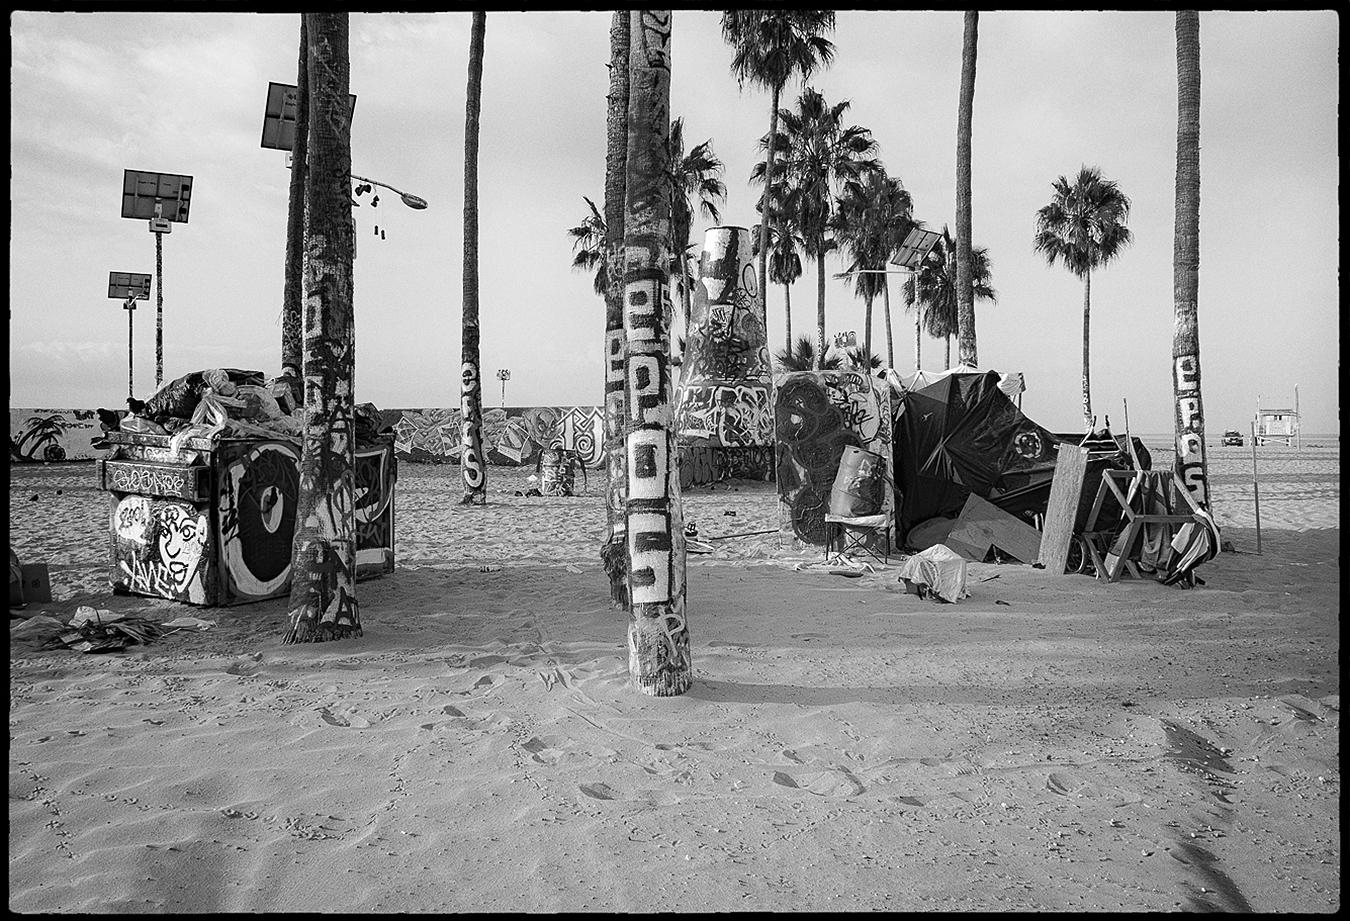 Ed_Simmons_street_art_venice_Beach_California-Palm_Trees